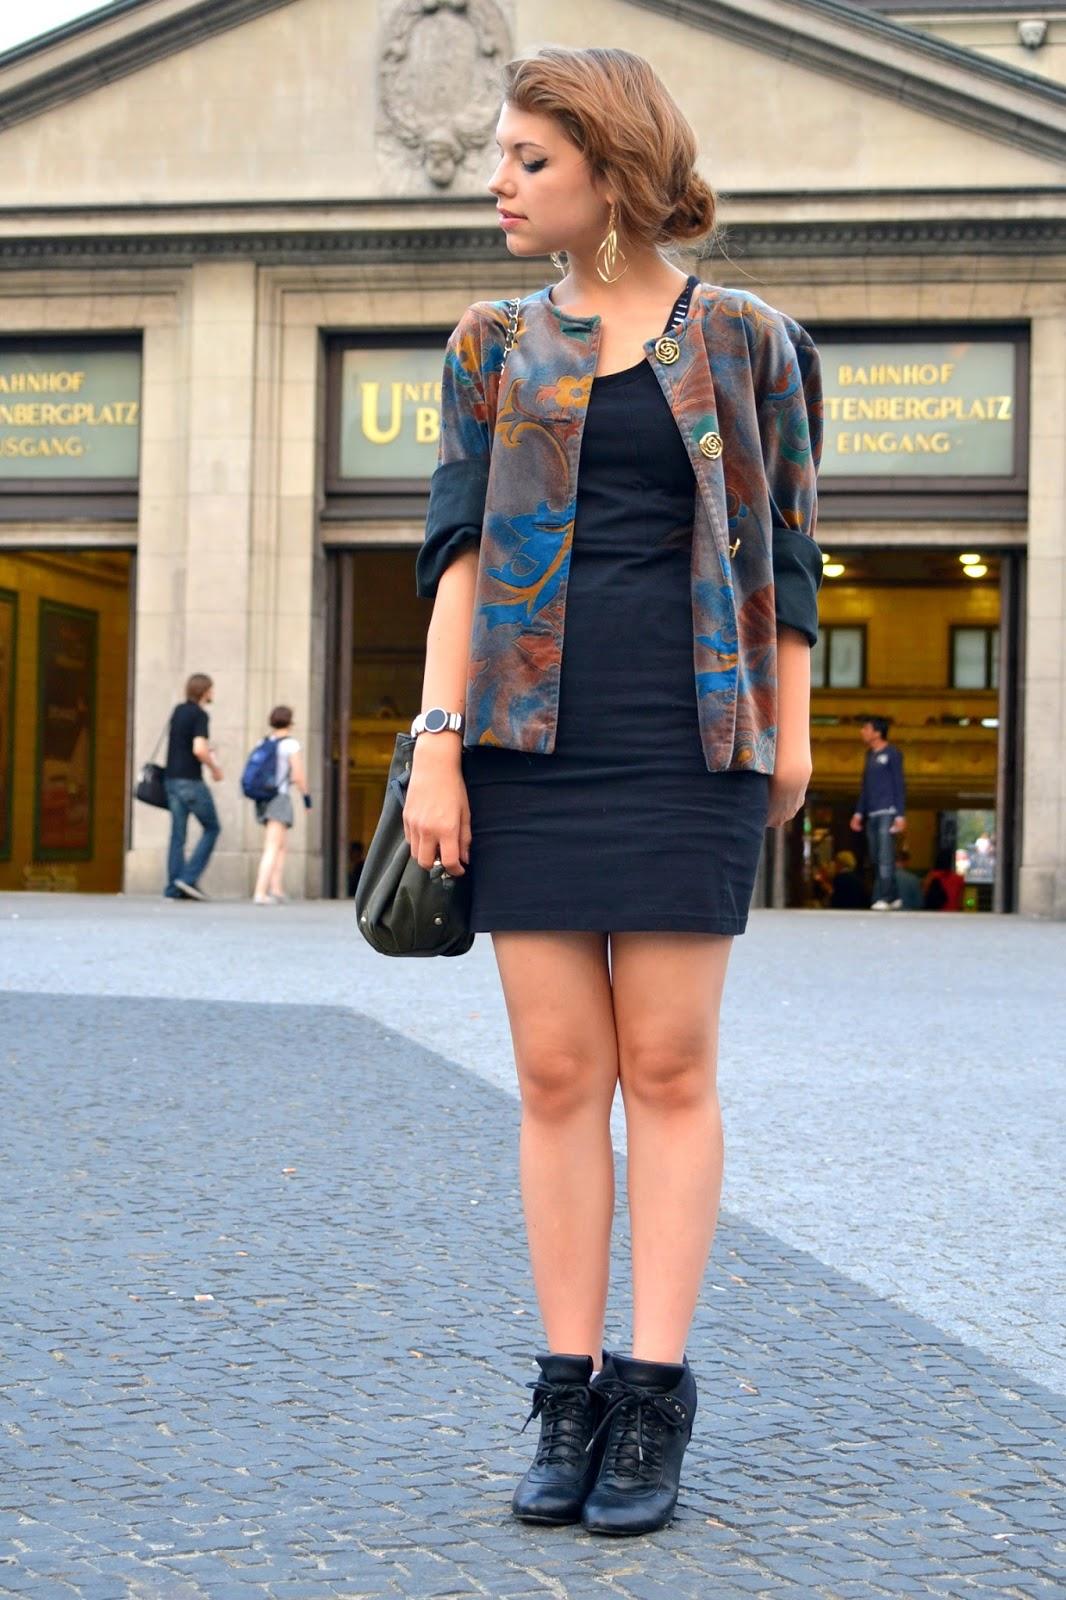 jasmin myberlinfashion outfit post fashionblogger kadewe berlin wittenbergplatz